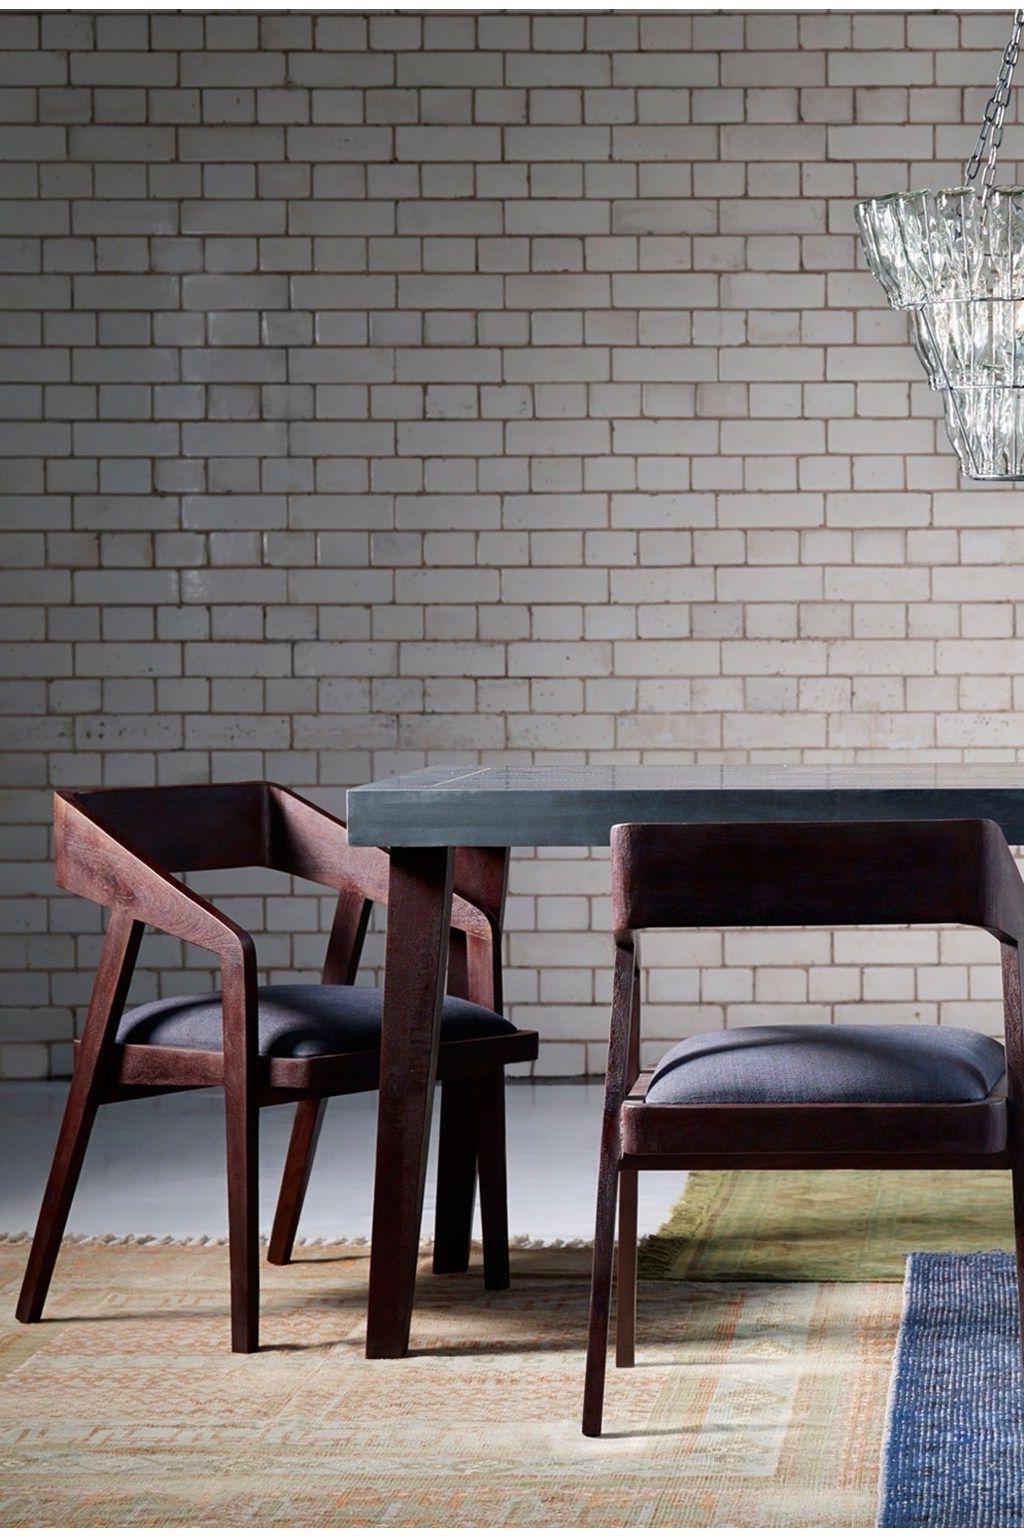 Newest Sheesham Wood Dining Chairs Within Ul> <Li> Sheesham Wood And Viscose Chair</li> <Li> Stark Simple (View 13 of 25)